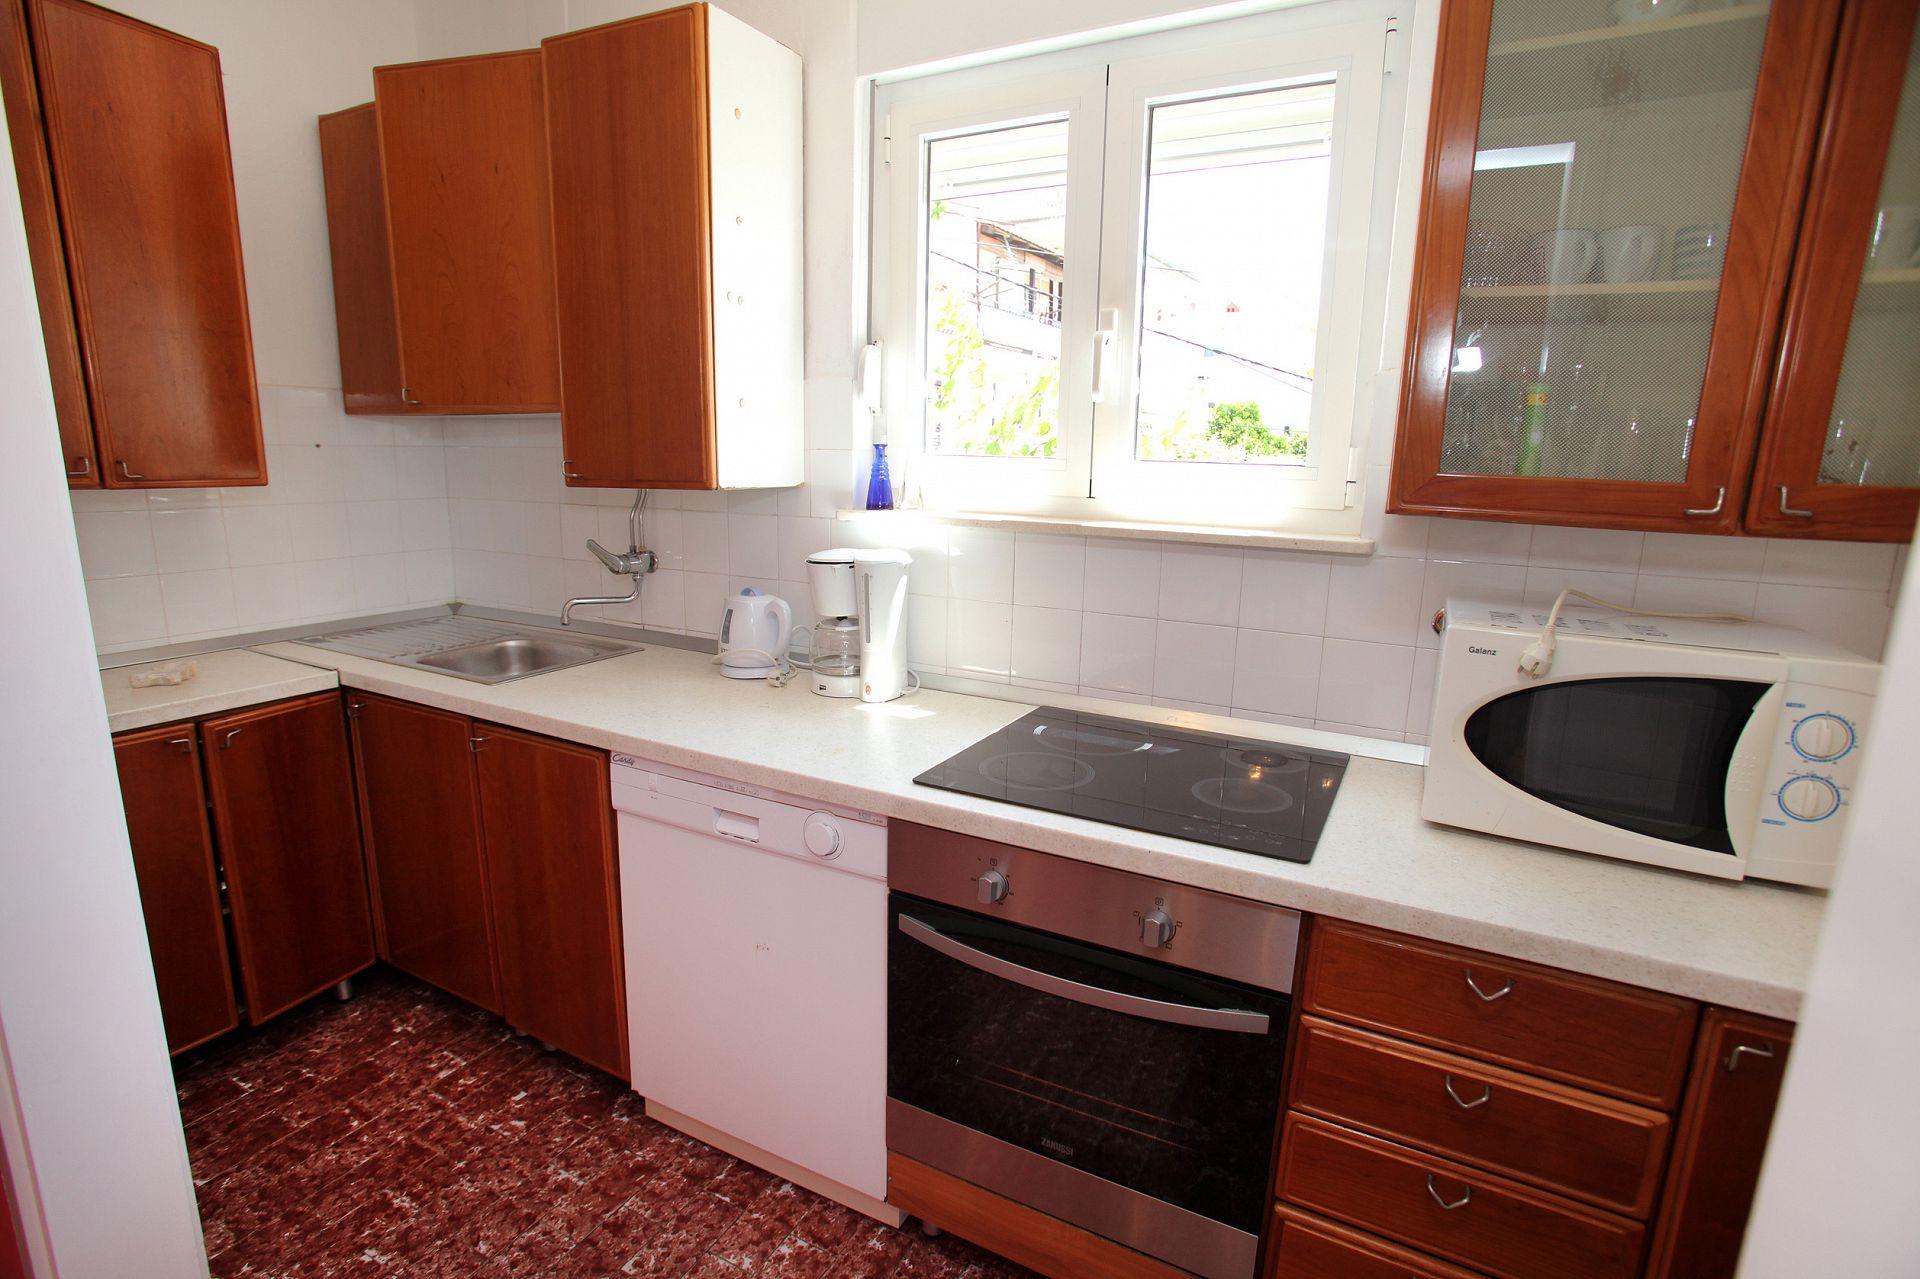 01707TROG  - Trogir - Appartements Croatie - A4(6): cuisine